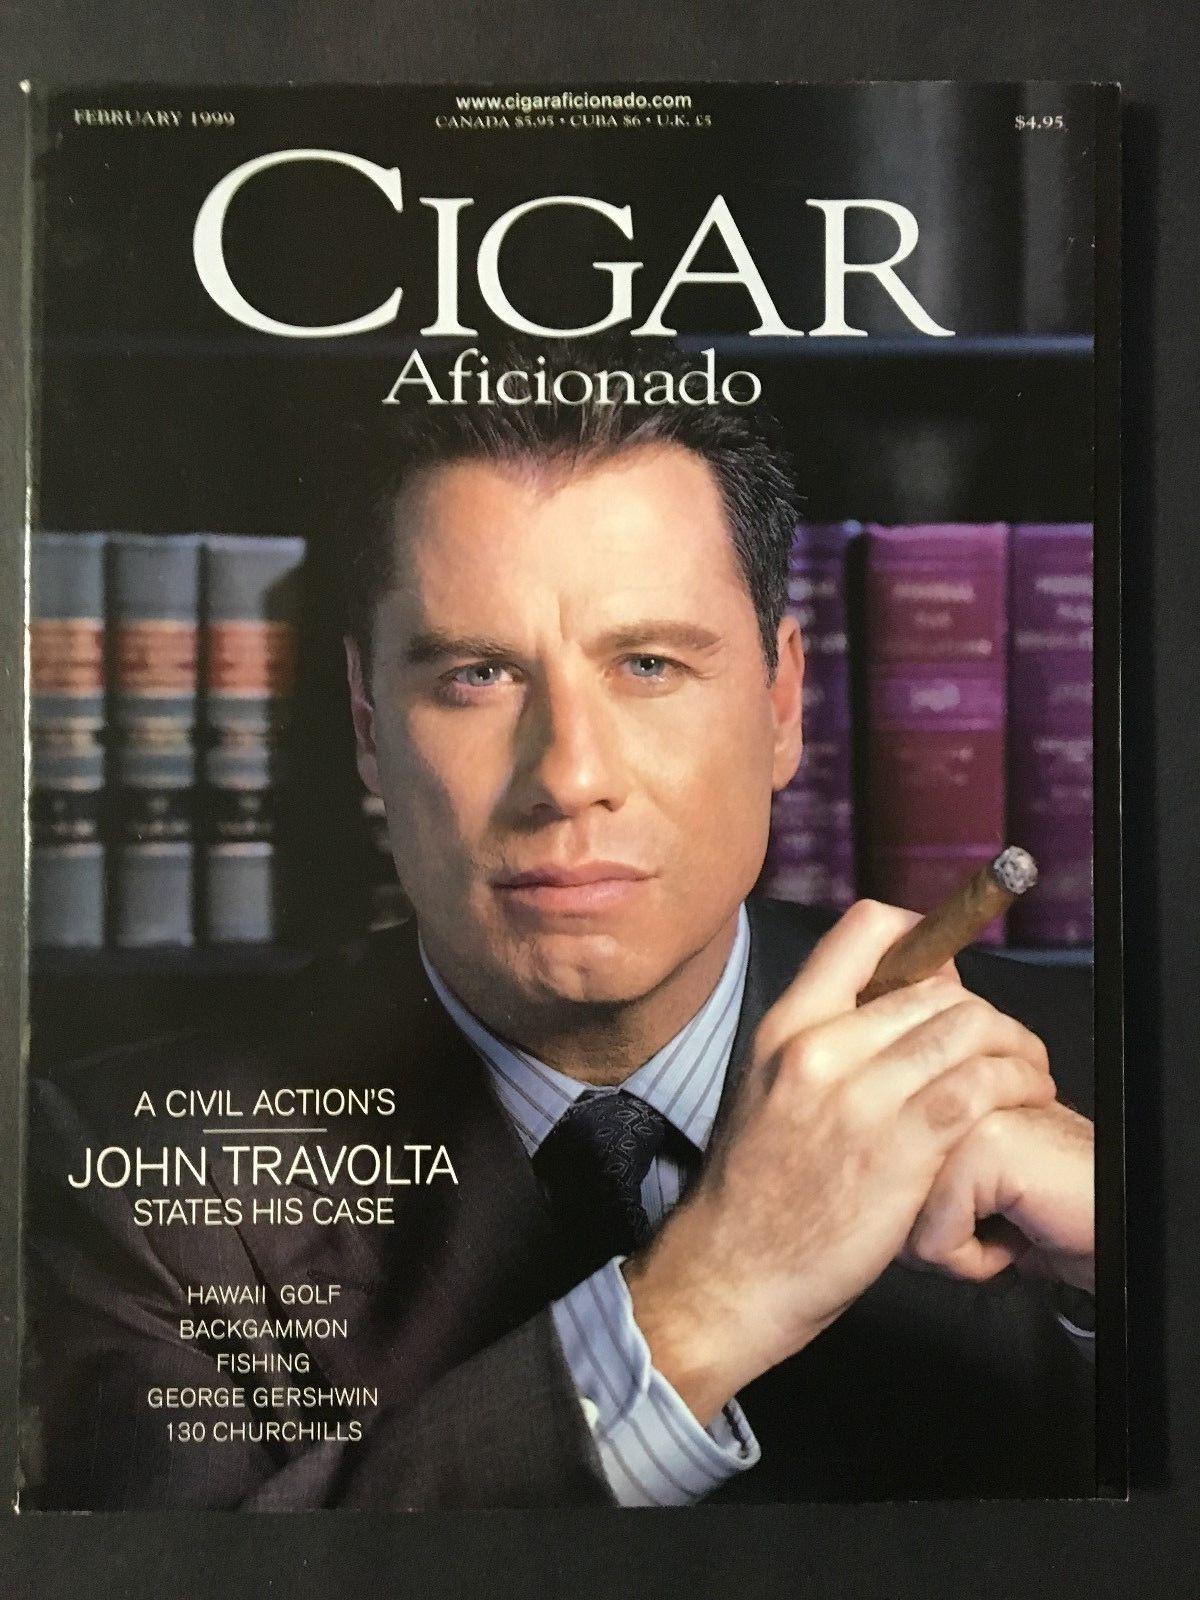 cigar-aficionado-magazine-february-1999-john-travolta.jpg